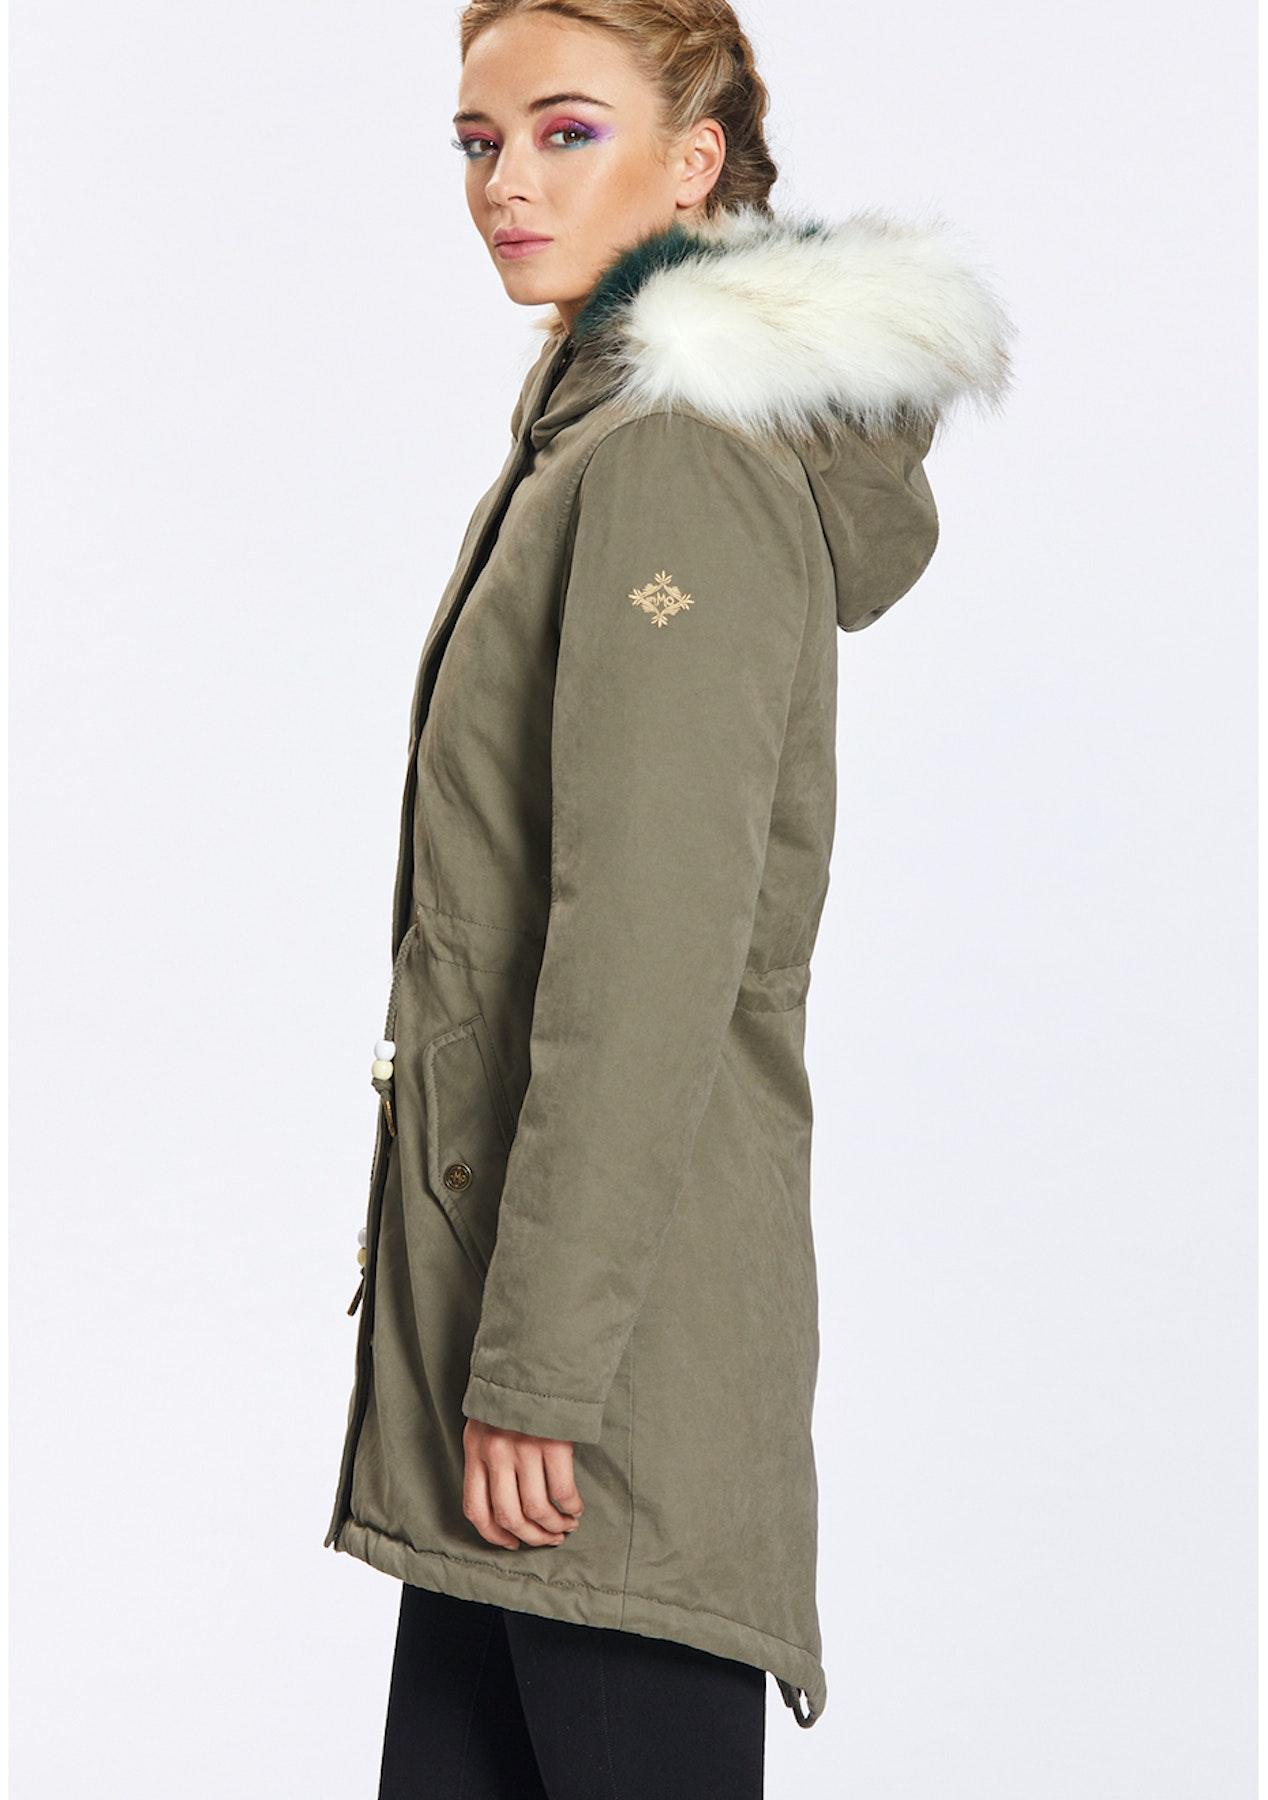 c053ec8e myMO Parka - myMO Winter Jackets - Onceit